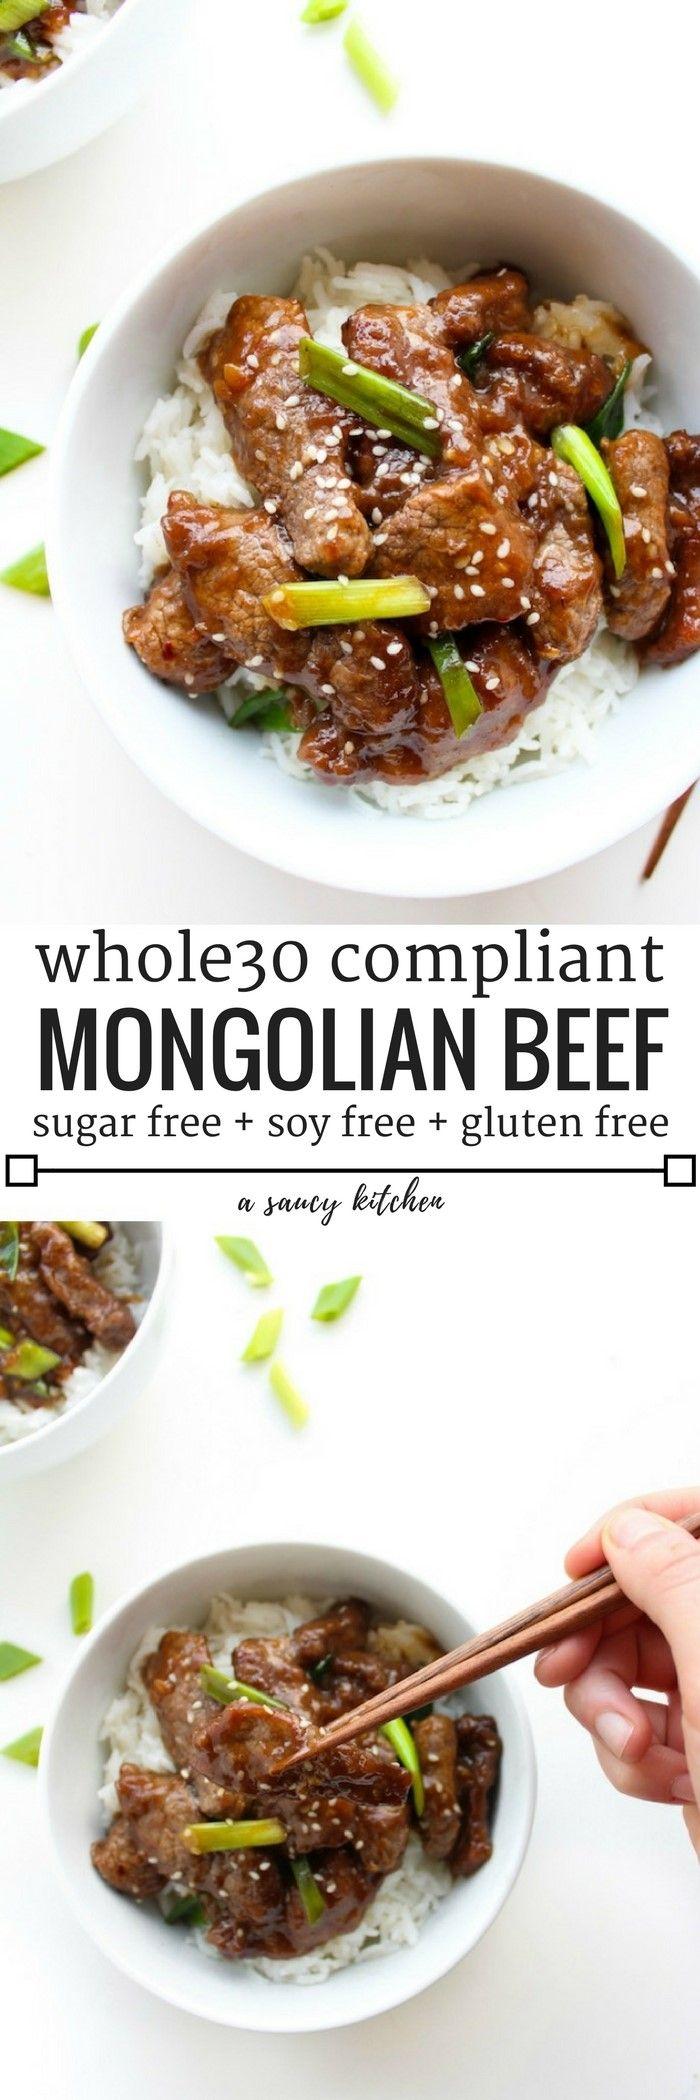 Whole 30 compliant Paleo Mongolian Beef | 10 ingredients, gluten, sugar,